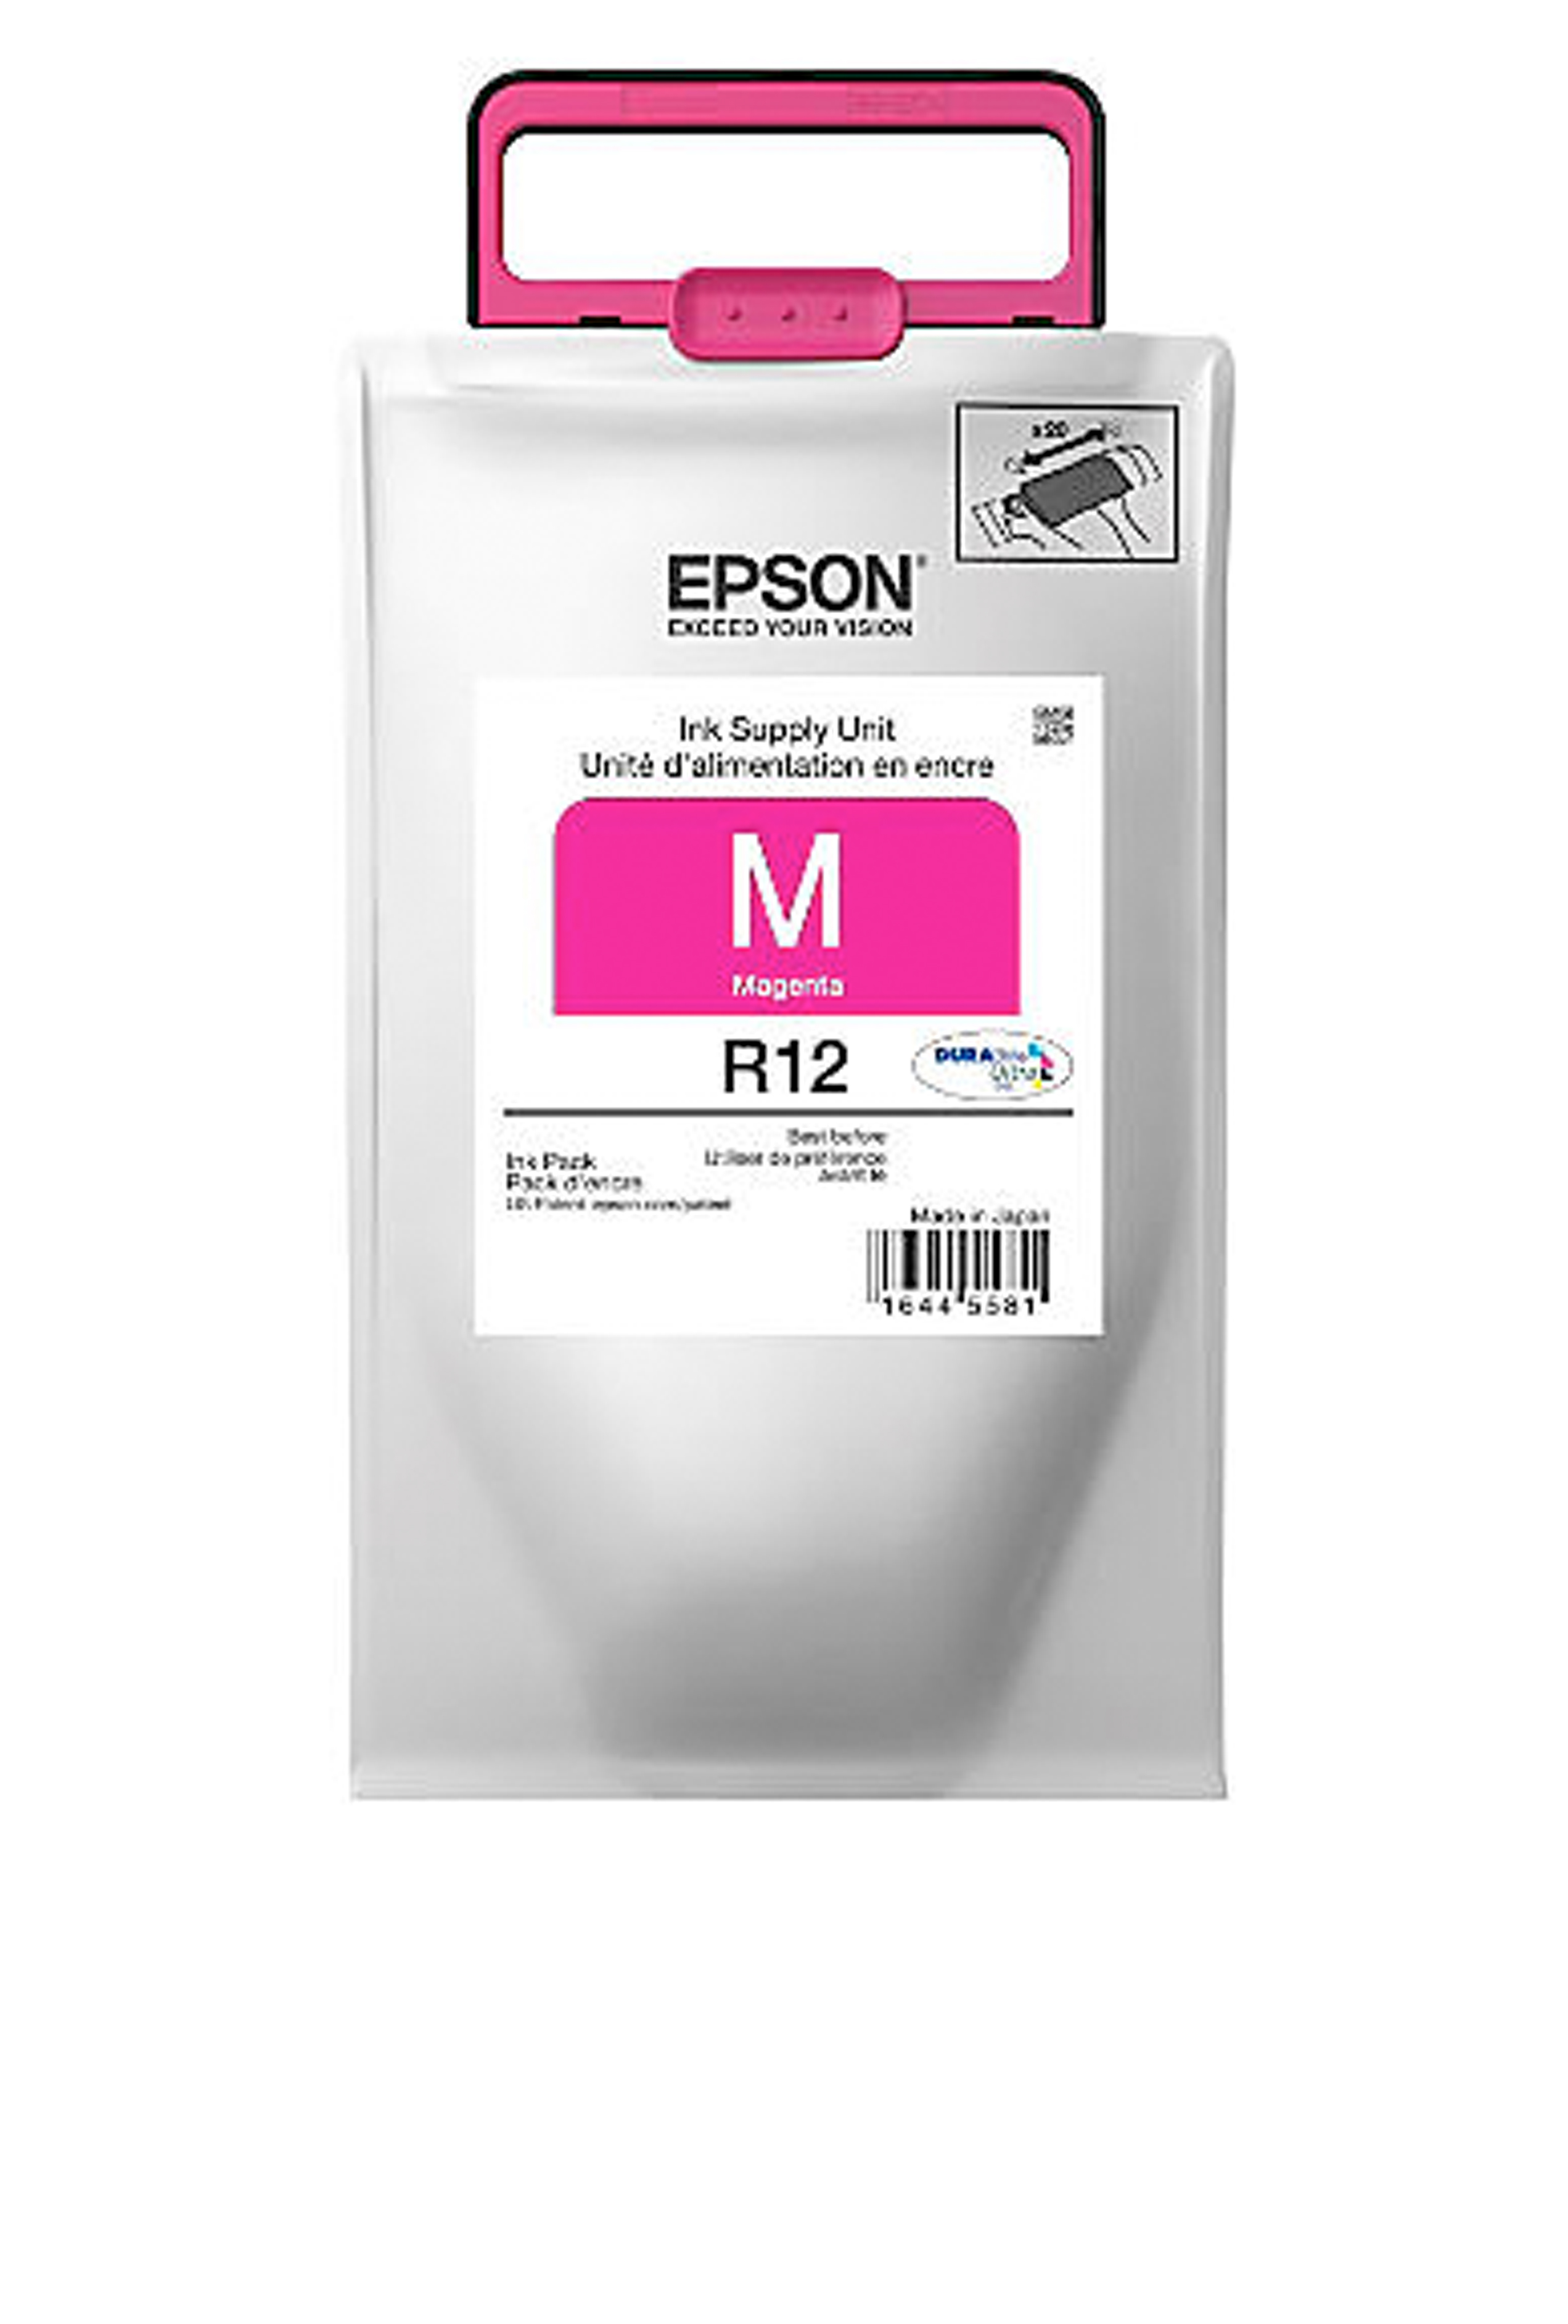 Epson R12, Magenta Ink Pack (TR12320)